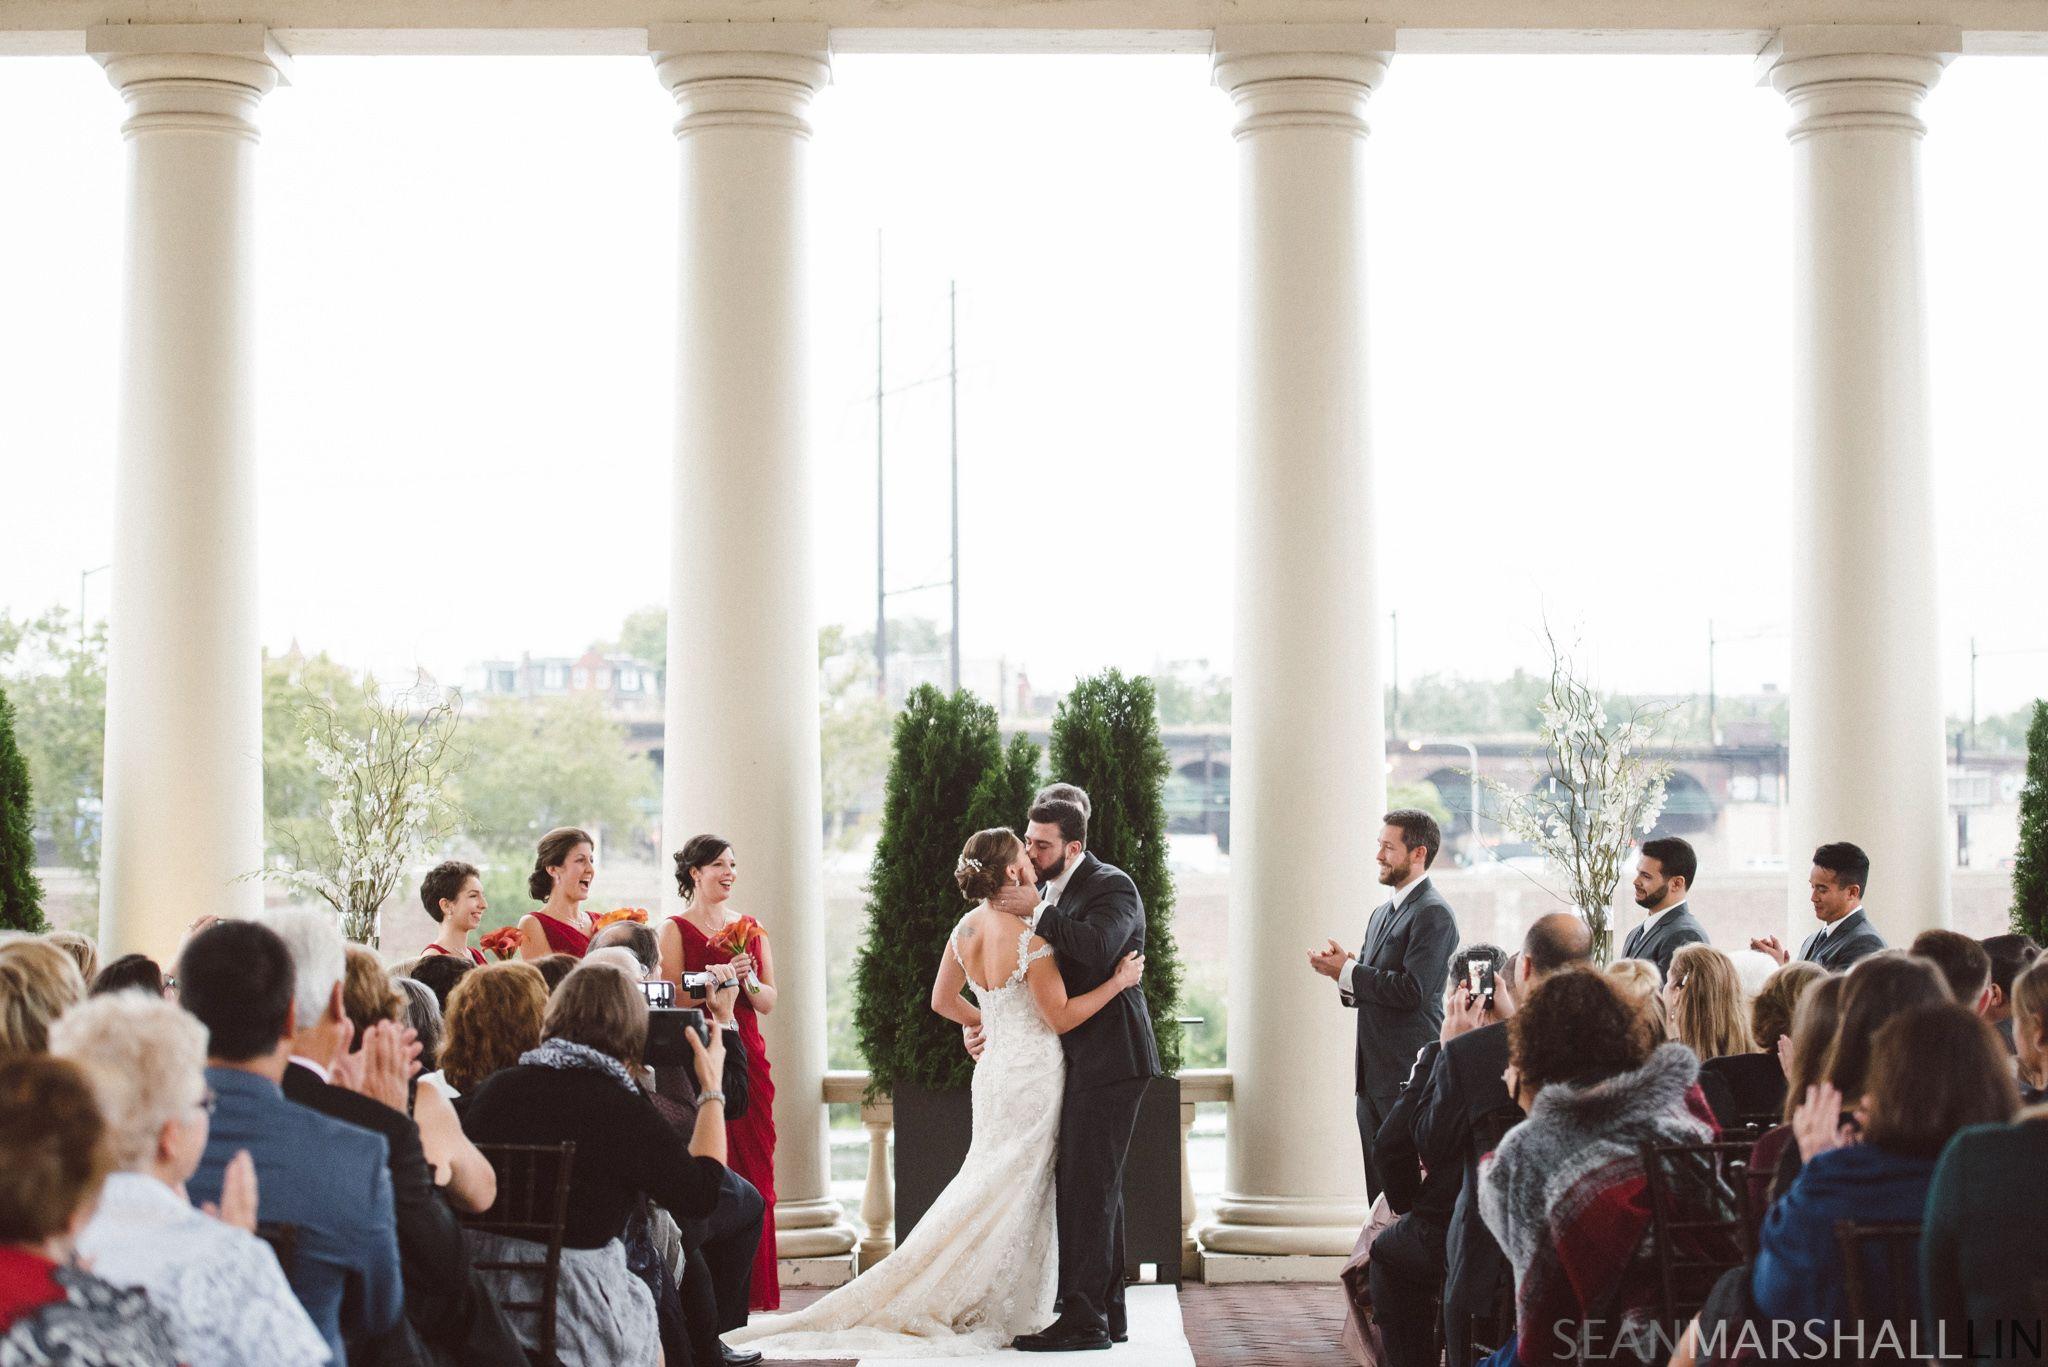 marriedbymyfatherinlaw #kissthebride #wedding #schuylkillriver ...